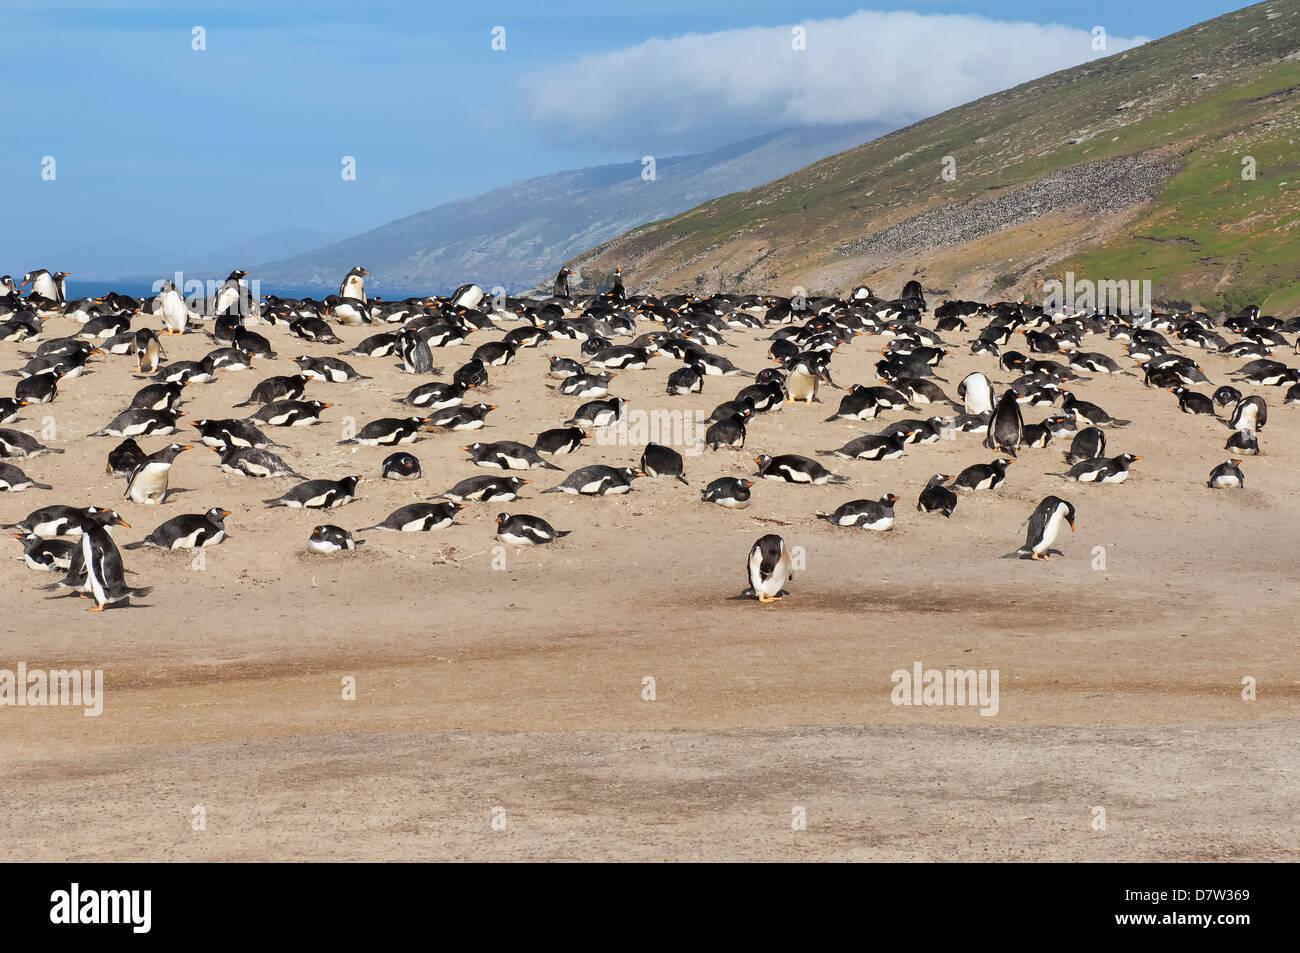 Pinguino Gentoo (Pygoscelis papua) rookery, Saunders Island, Isole Falkland, Sud America Immagini Stock